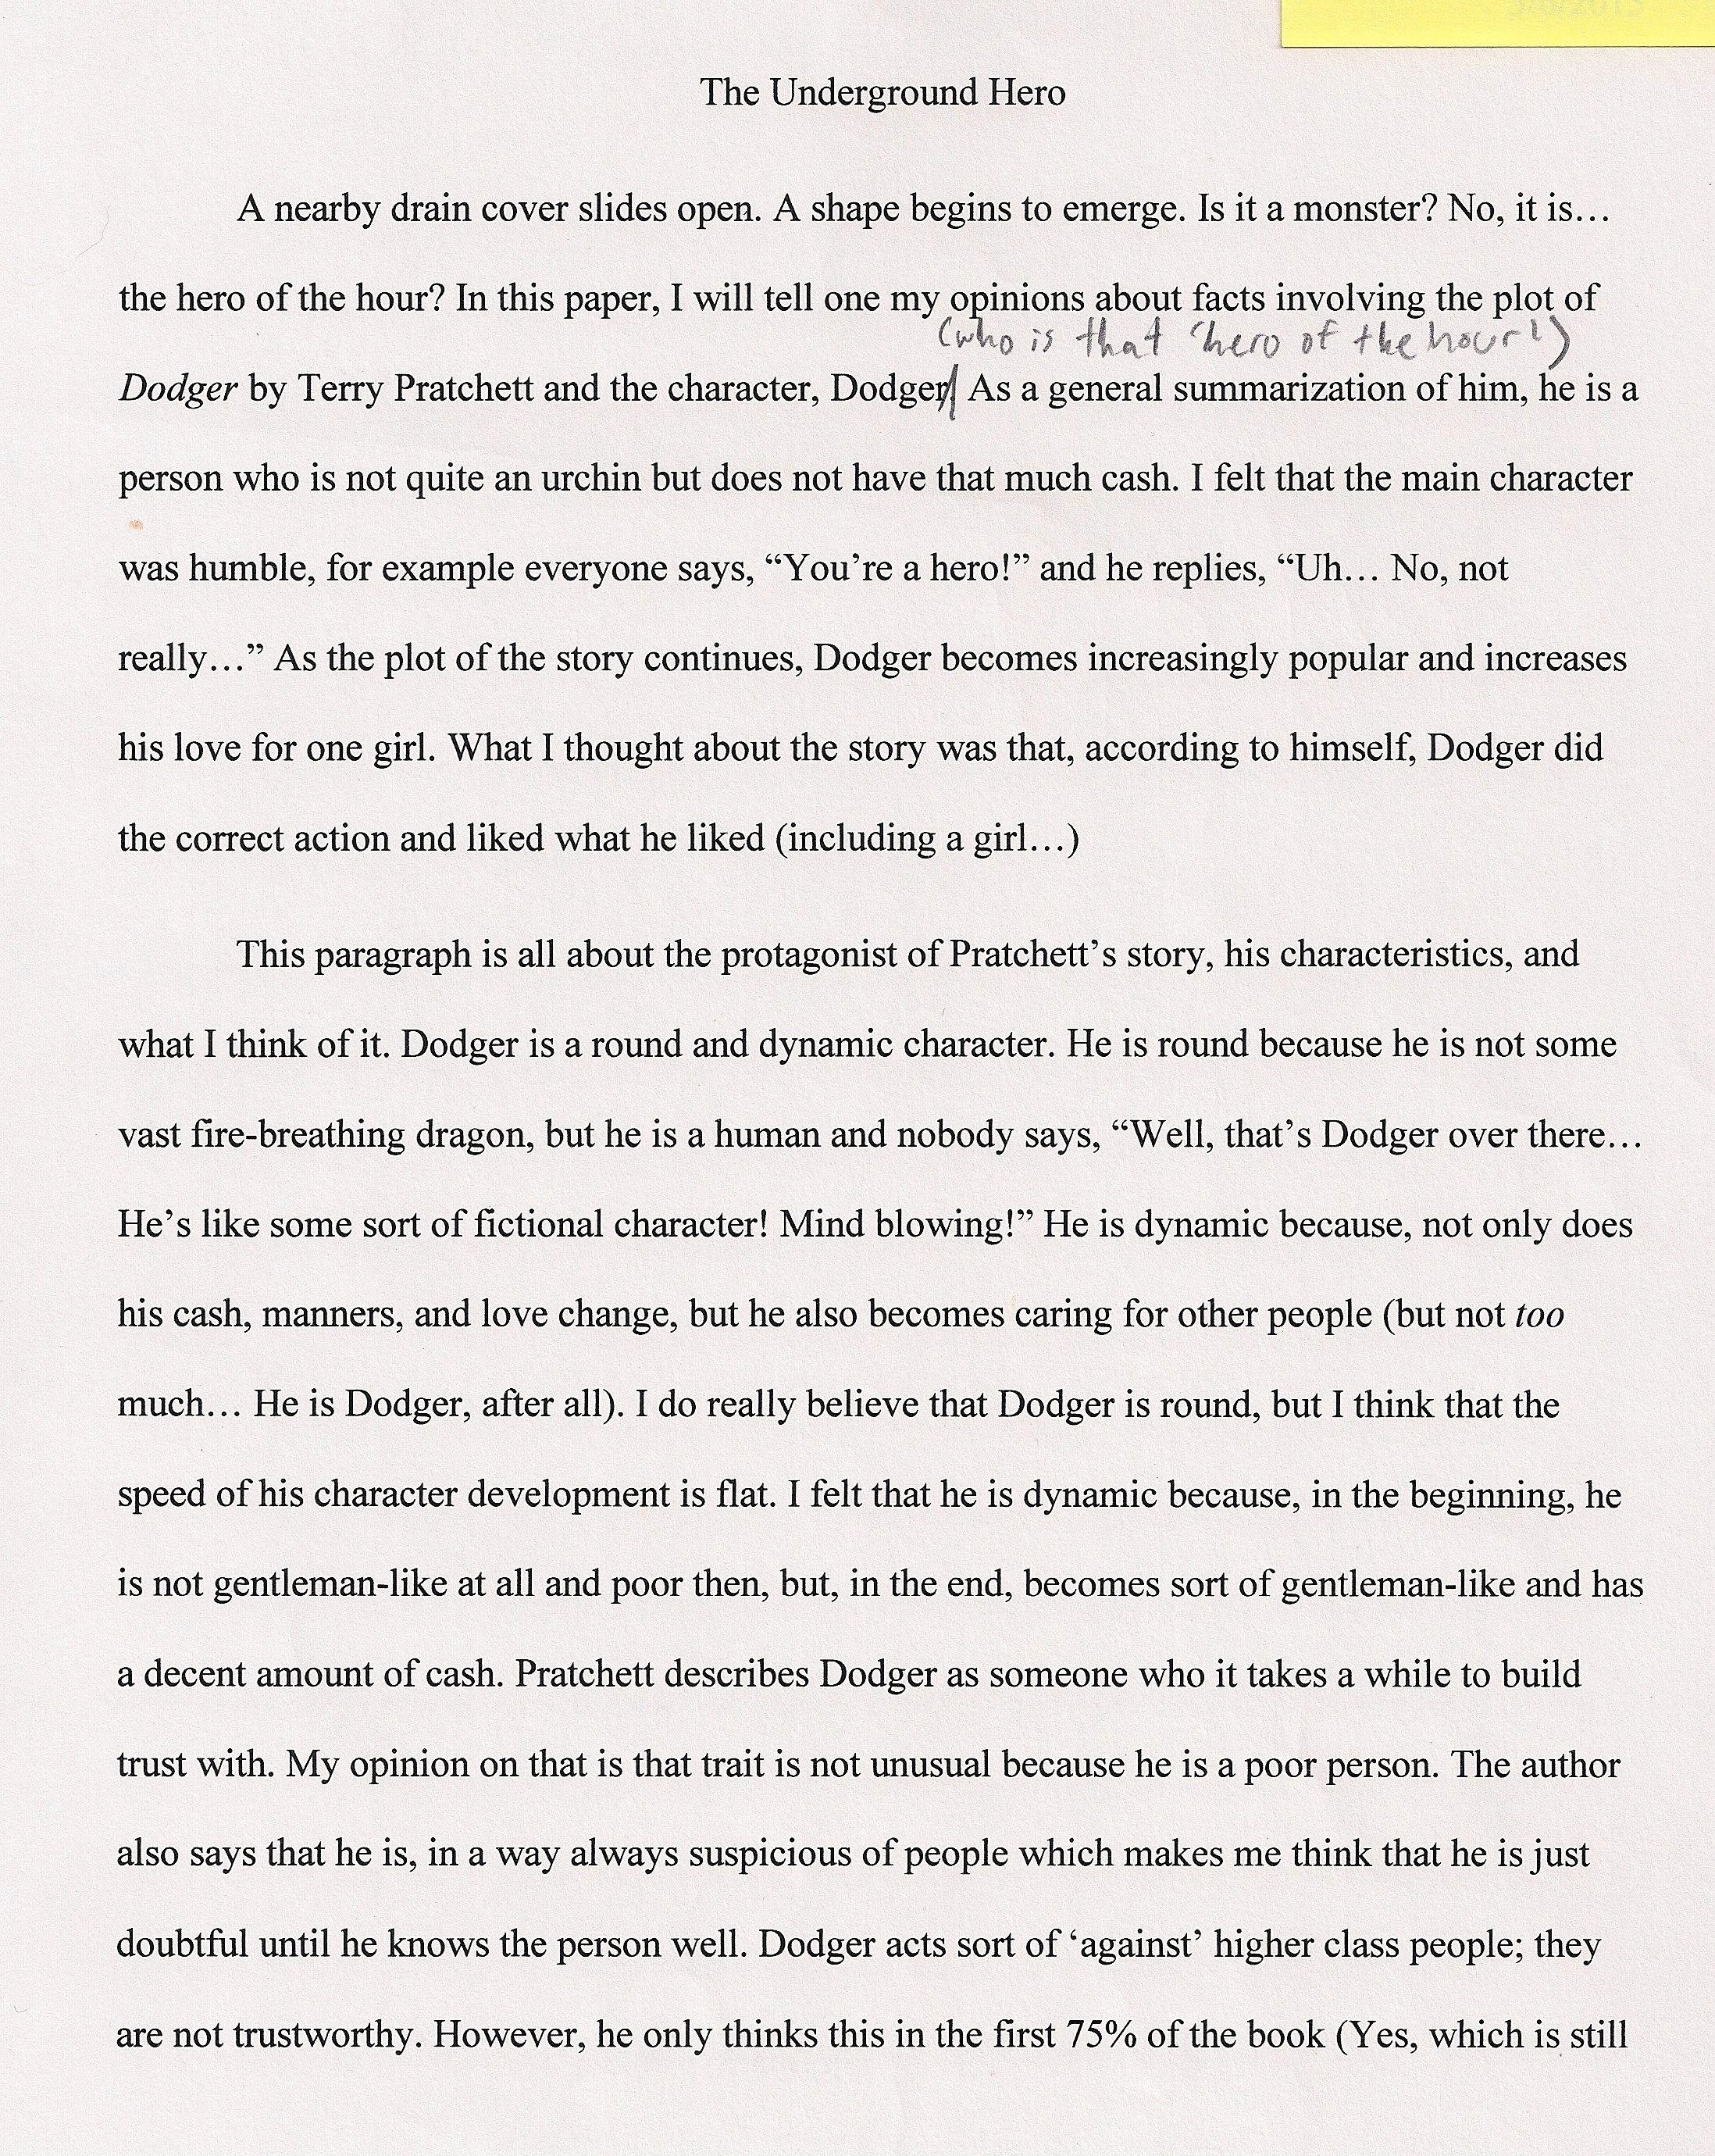 001 Hero Essays The Underground Staggering Essay Examples My Michigan Superhero Full